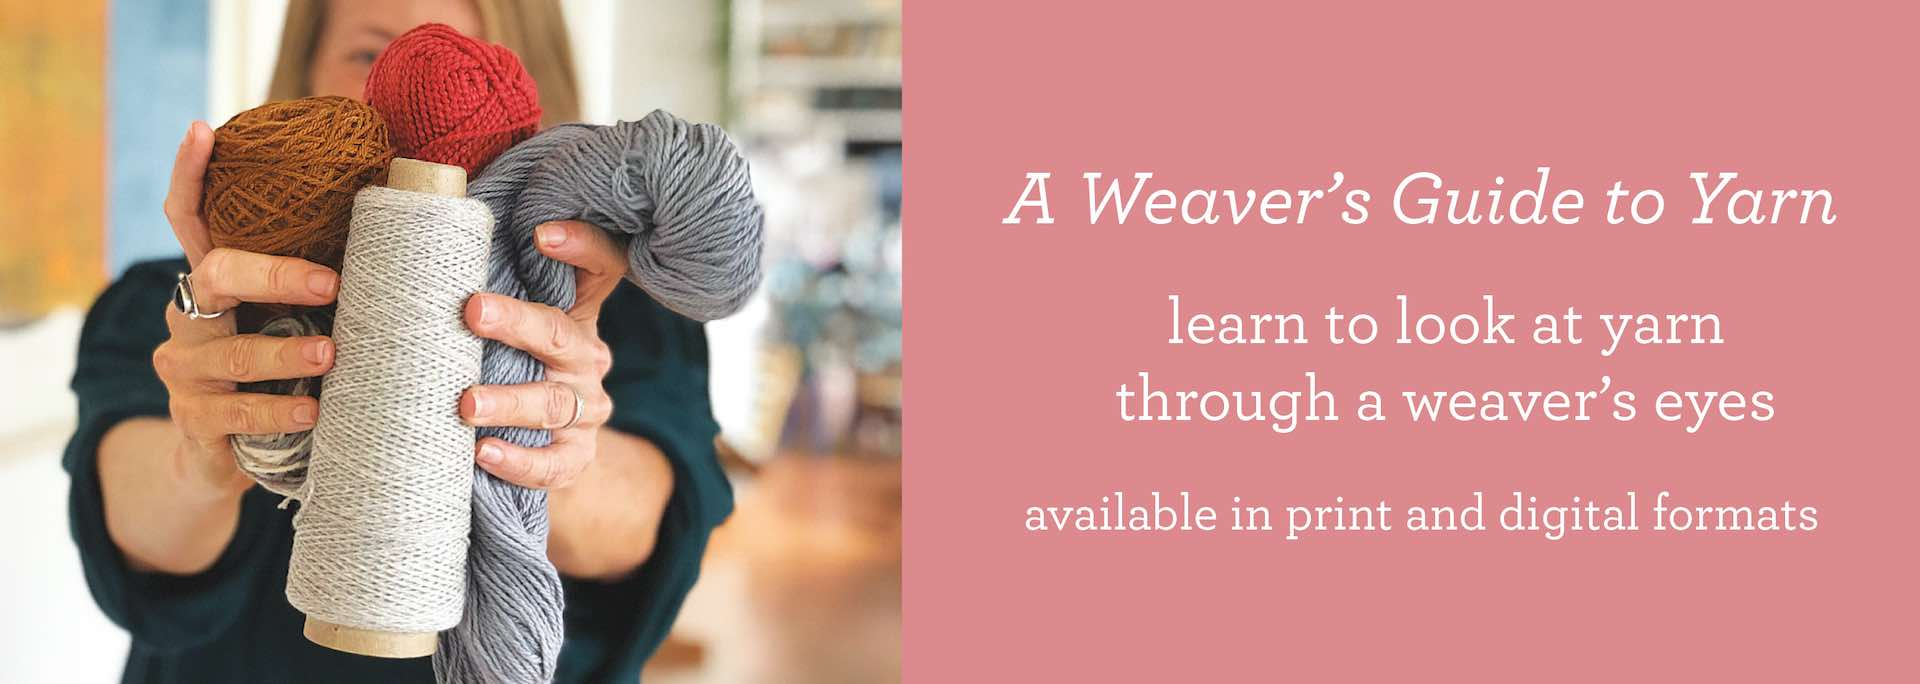 Weaver's Guide to Yarn-3